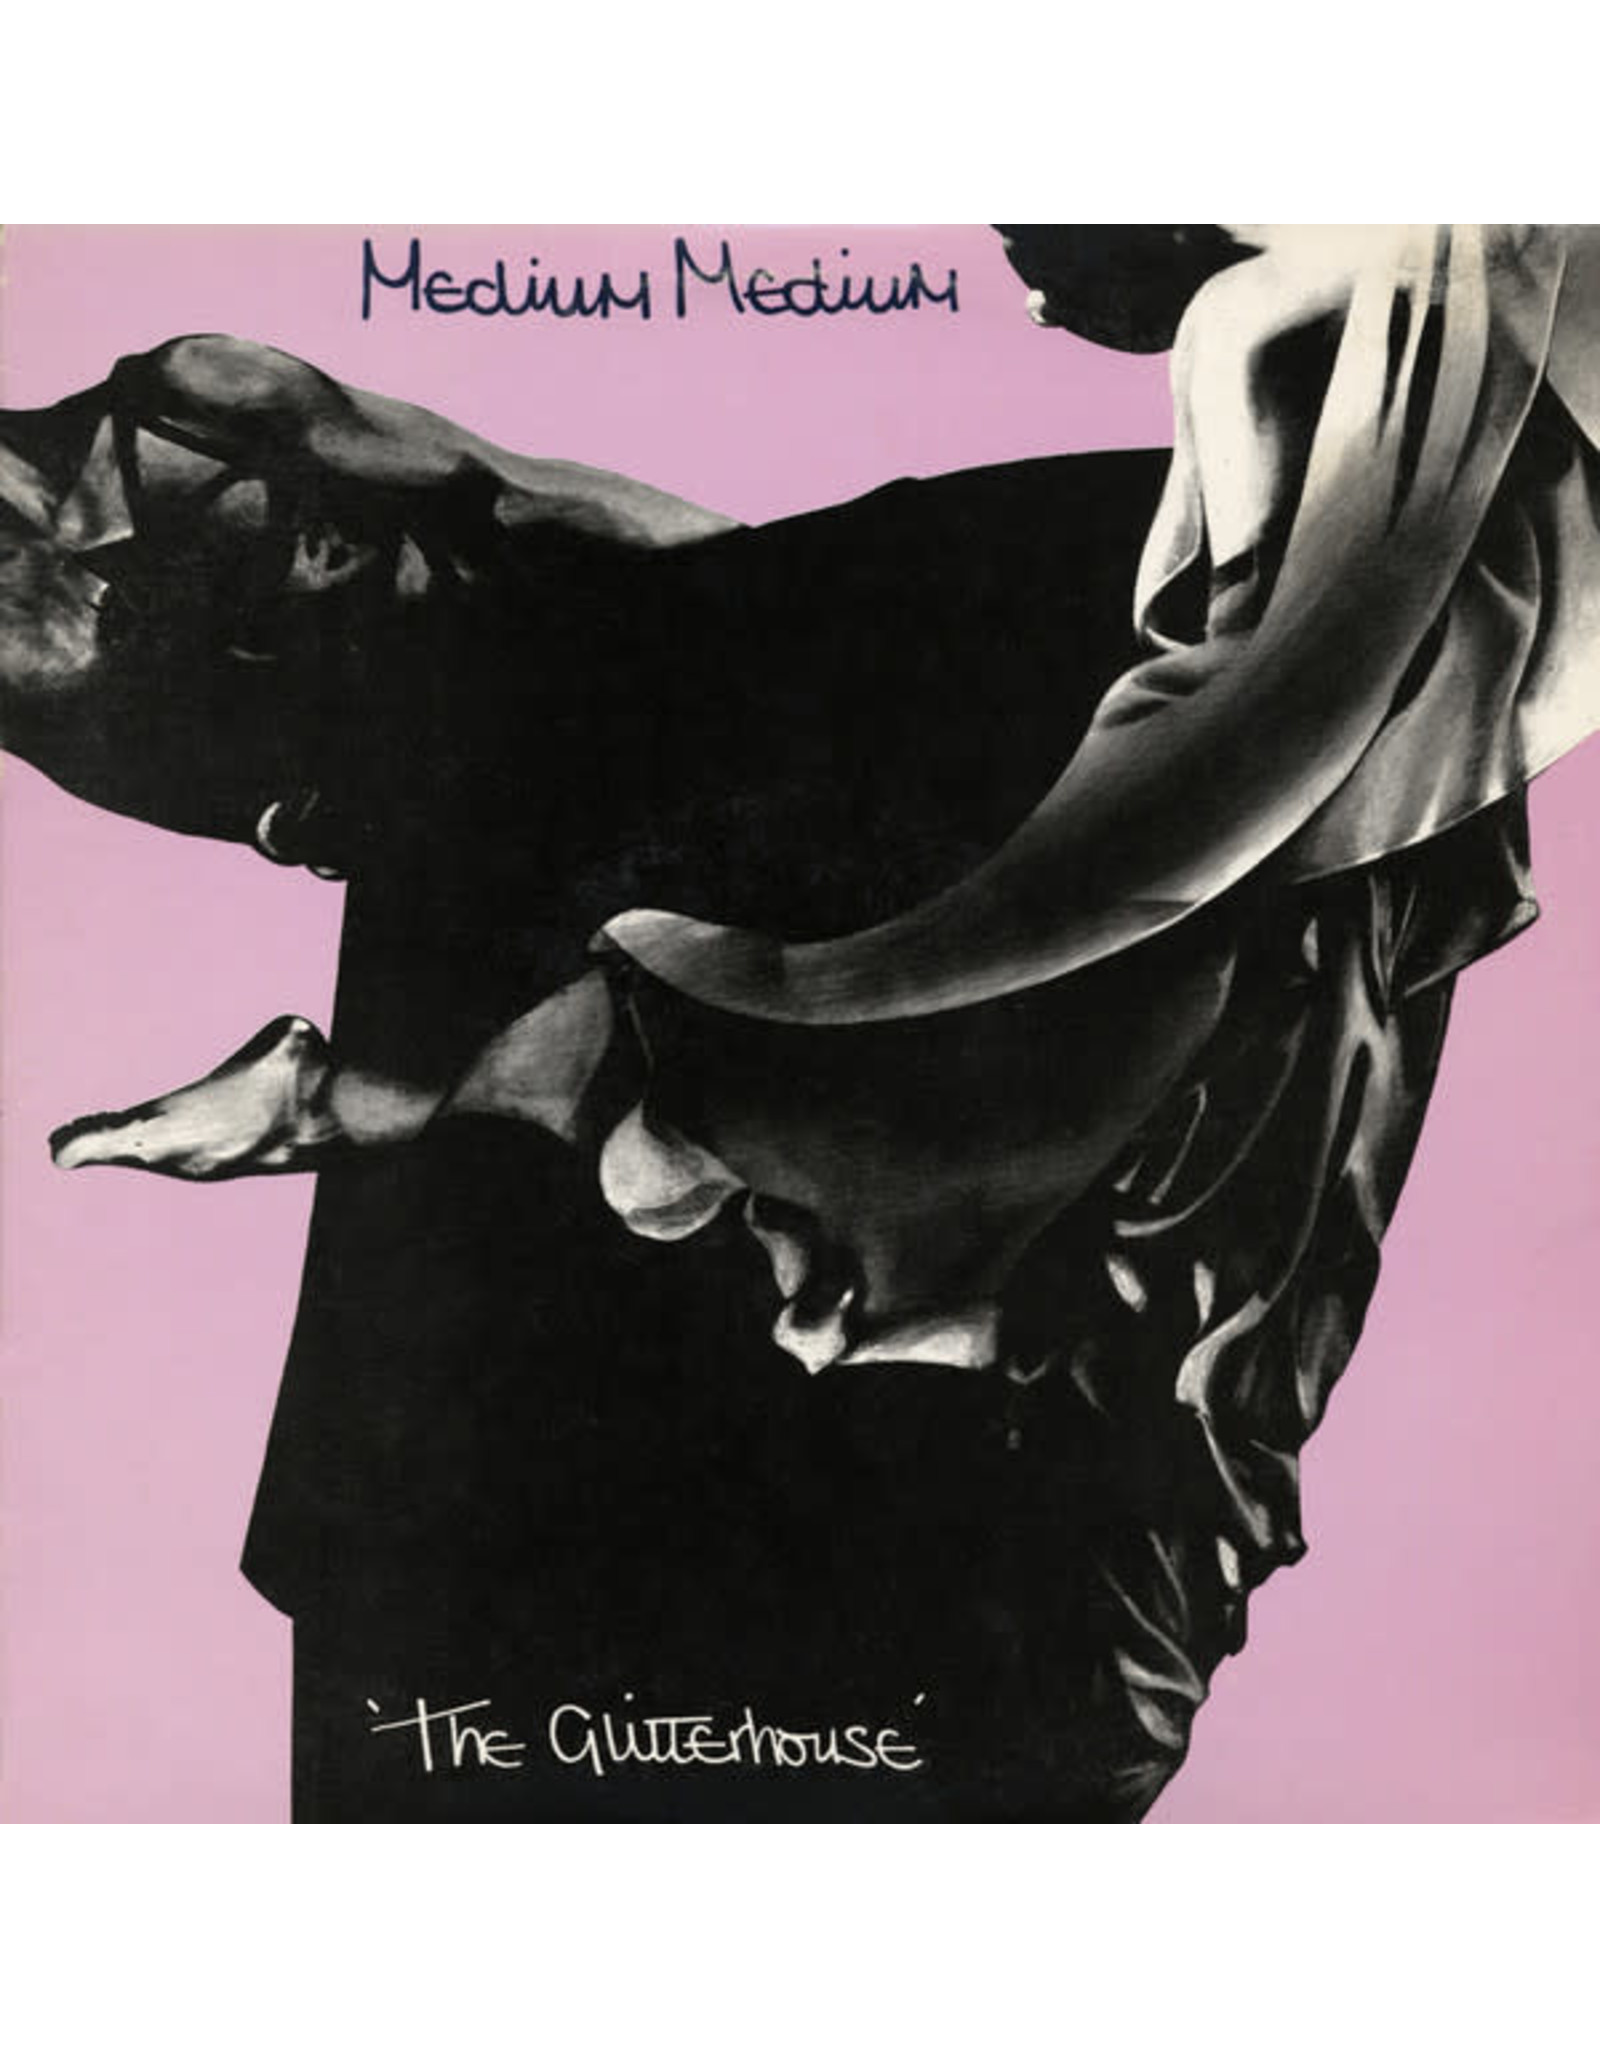 "New Vinyl Medium Medium - The Glitterhouse 2LP+12"""